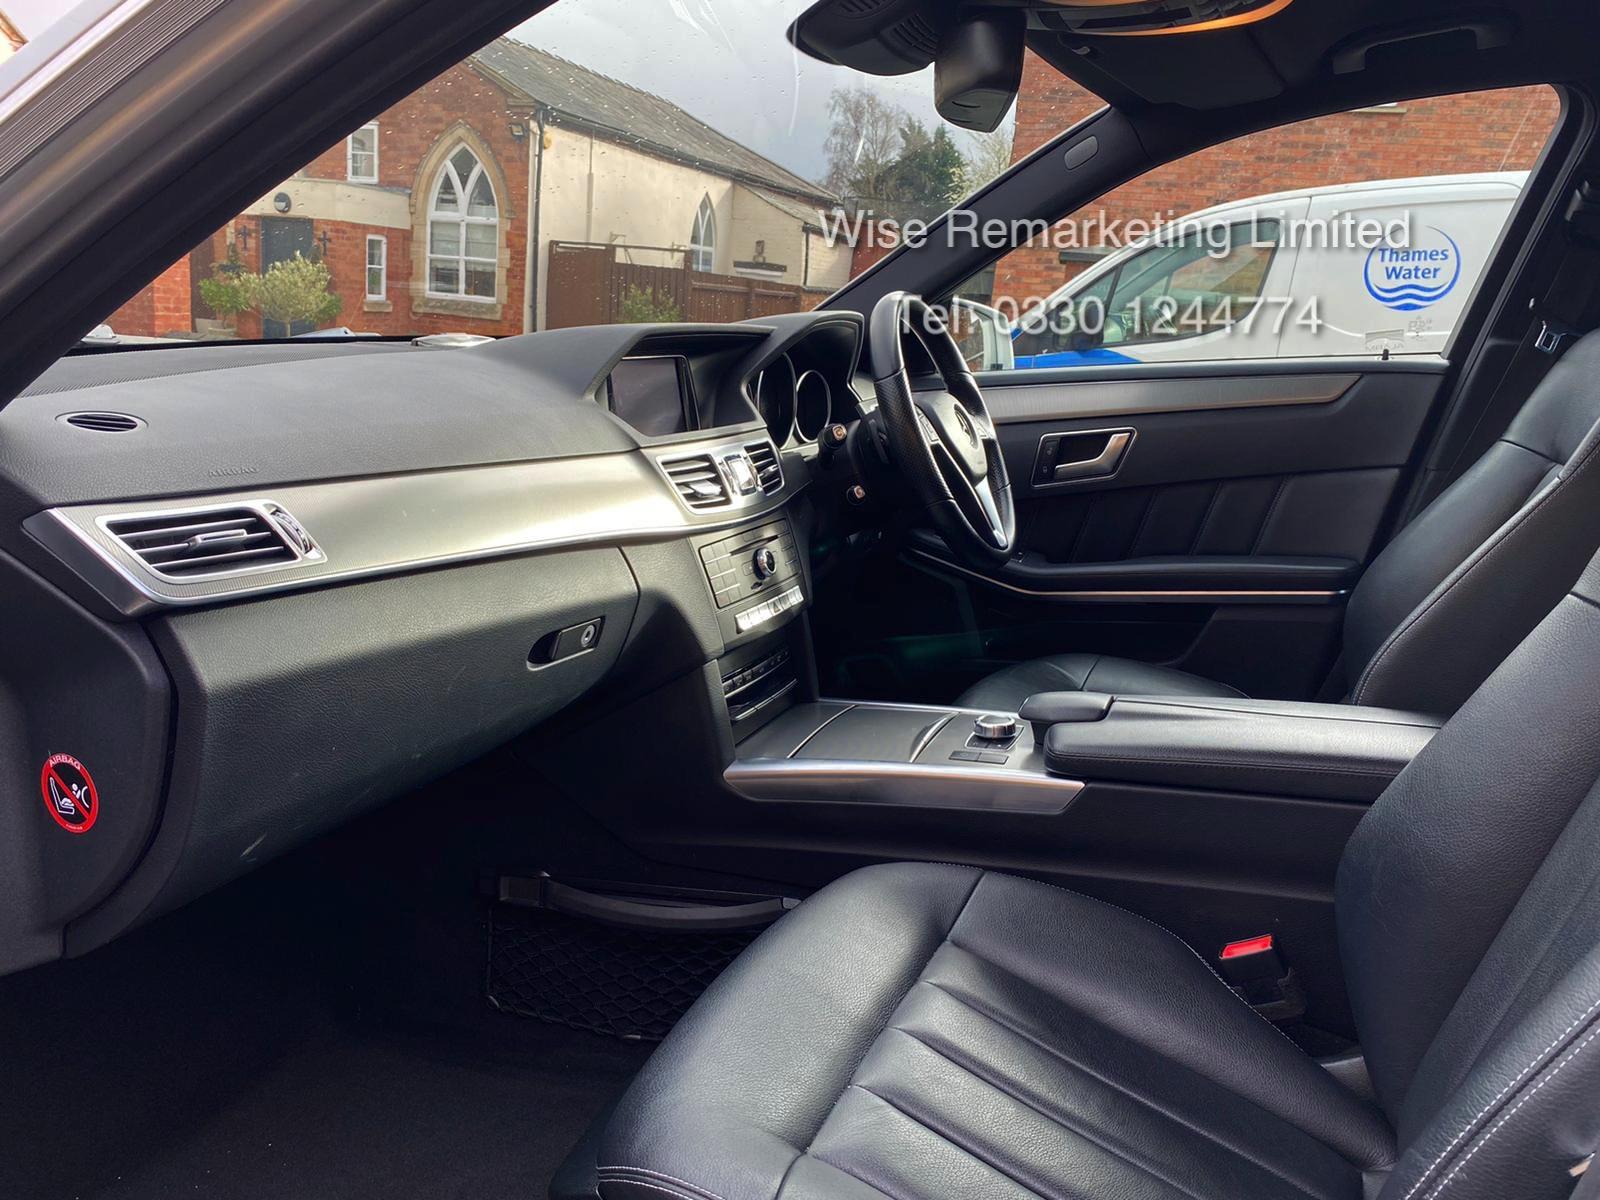 Mercedes E220d 2.1 Special Equipment Auto 2015 15 Reg - 1 Former Keeper - Sat Nav - Parking Sensors - Image 7 of 14